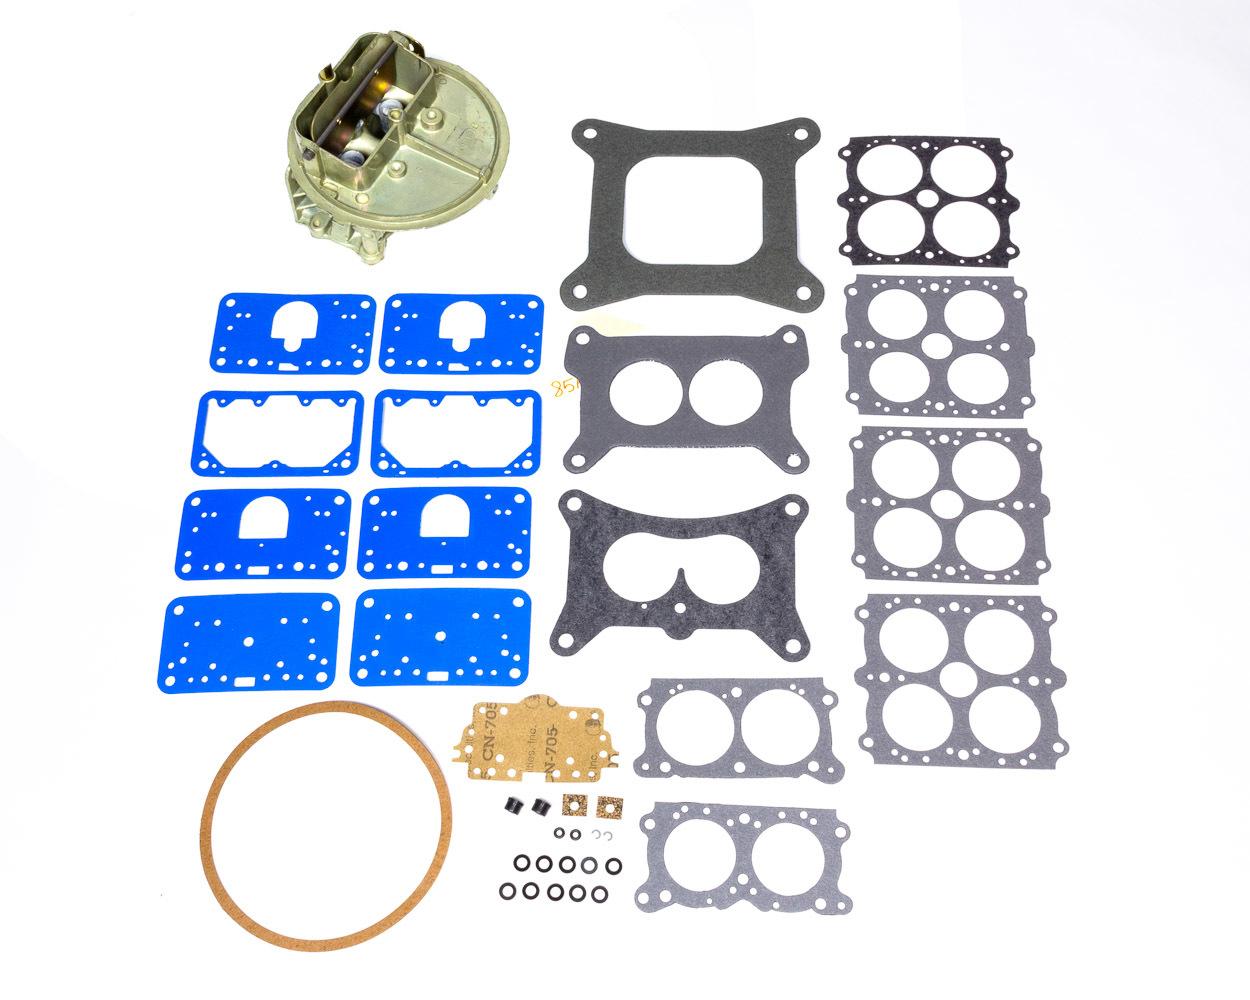 Holley 134-340 Carburetor Main Body, Replacement, 350 CFM, Zinc, Chromate, Holley Performance Model 2300 Carburetor, Kit